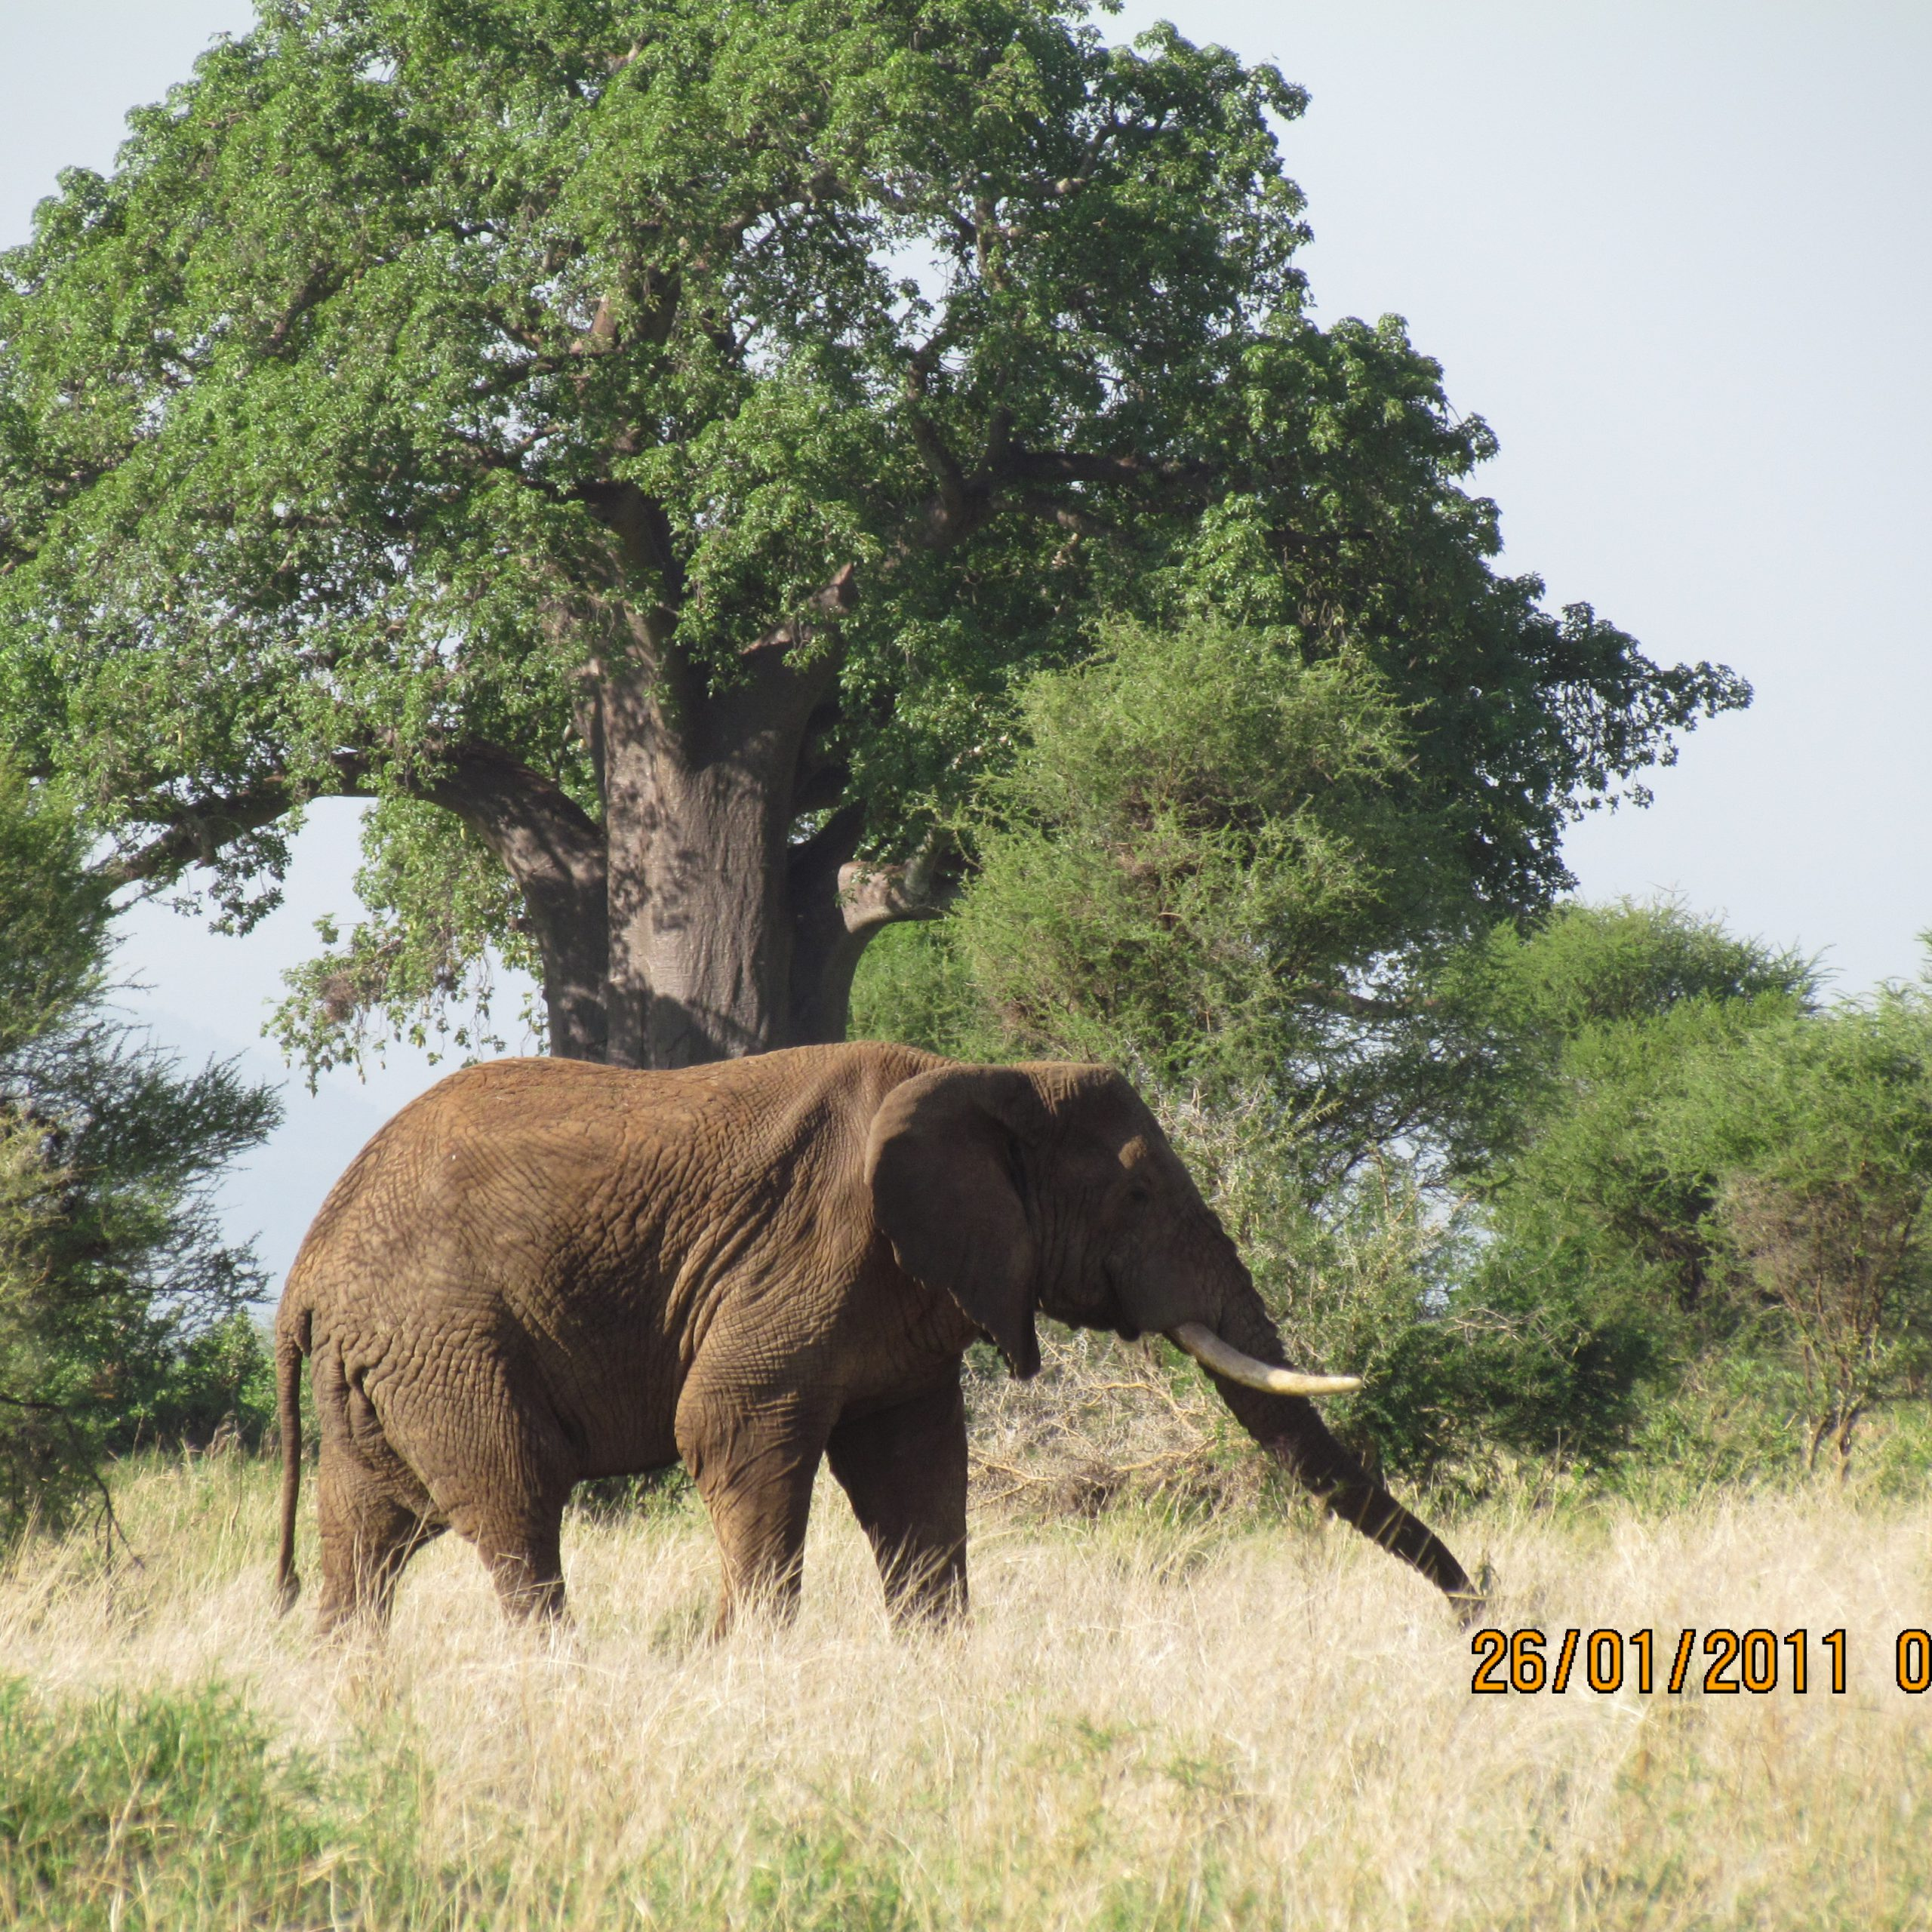 Day 10: Ngorongoro Conservation Area to Tarangire Nationl Park then to Arusha